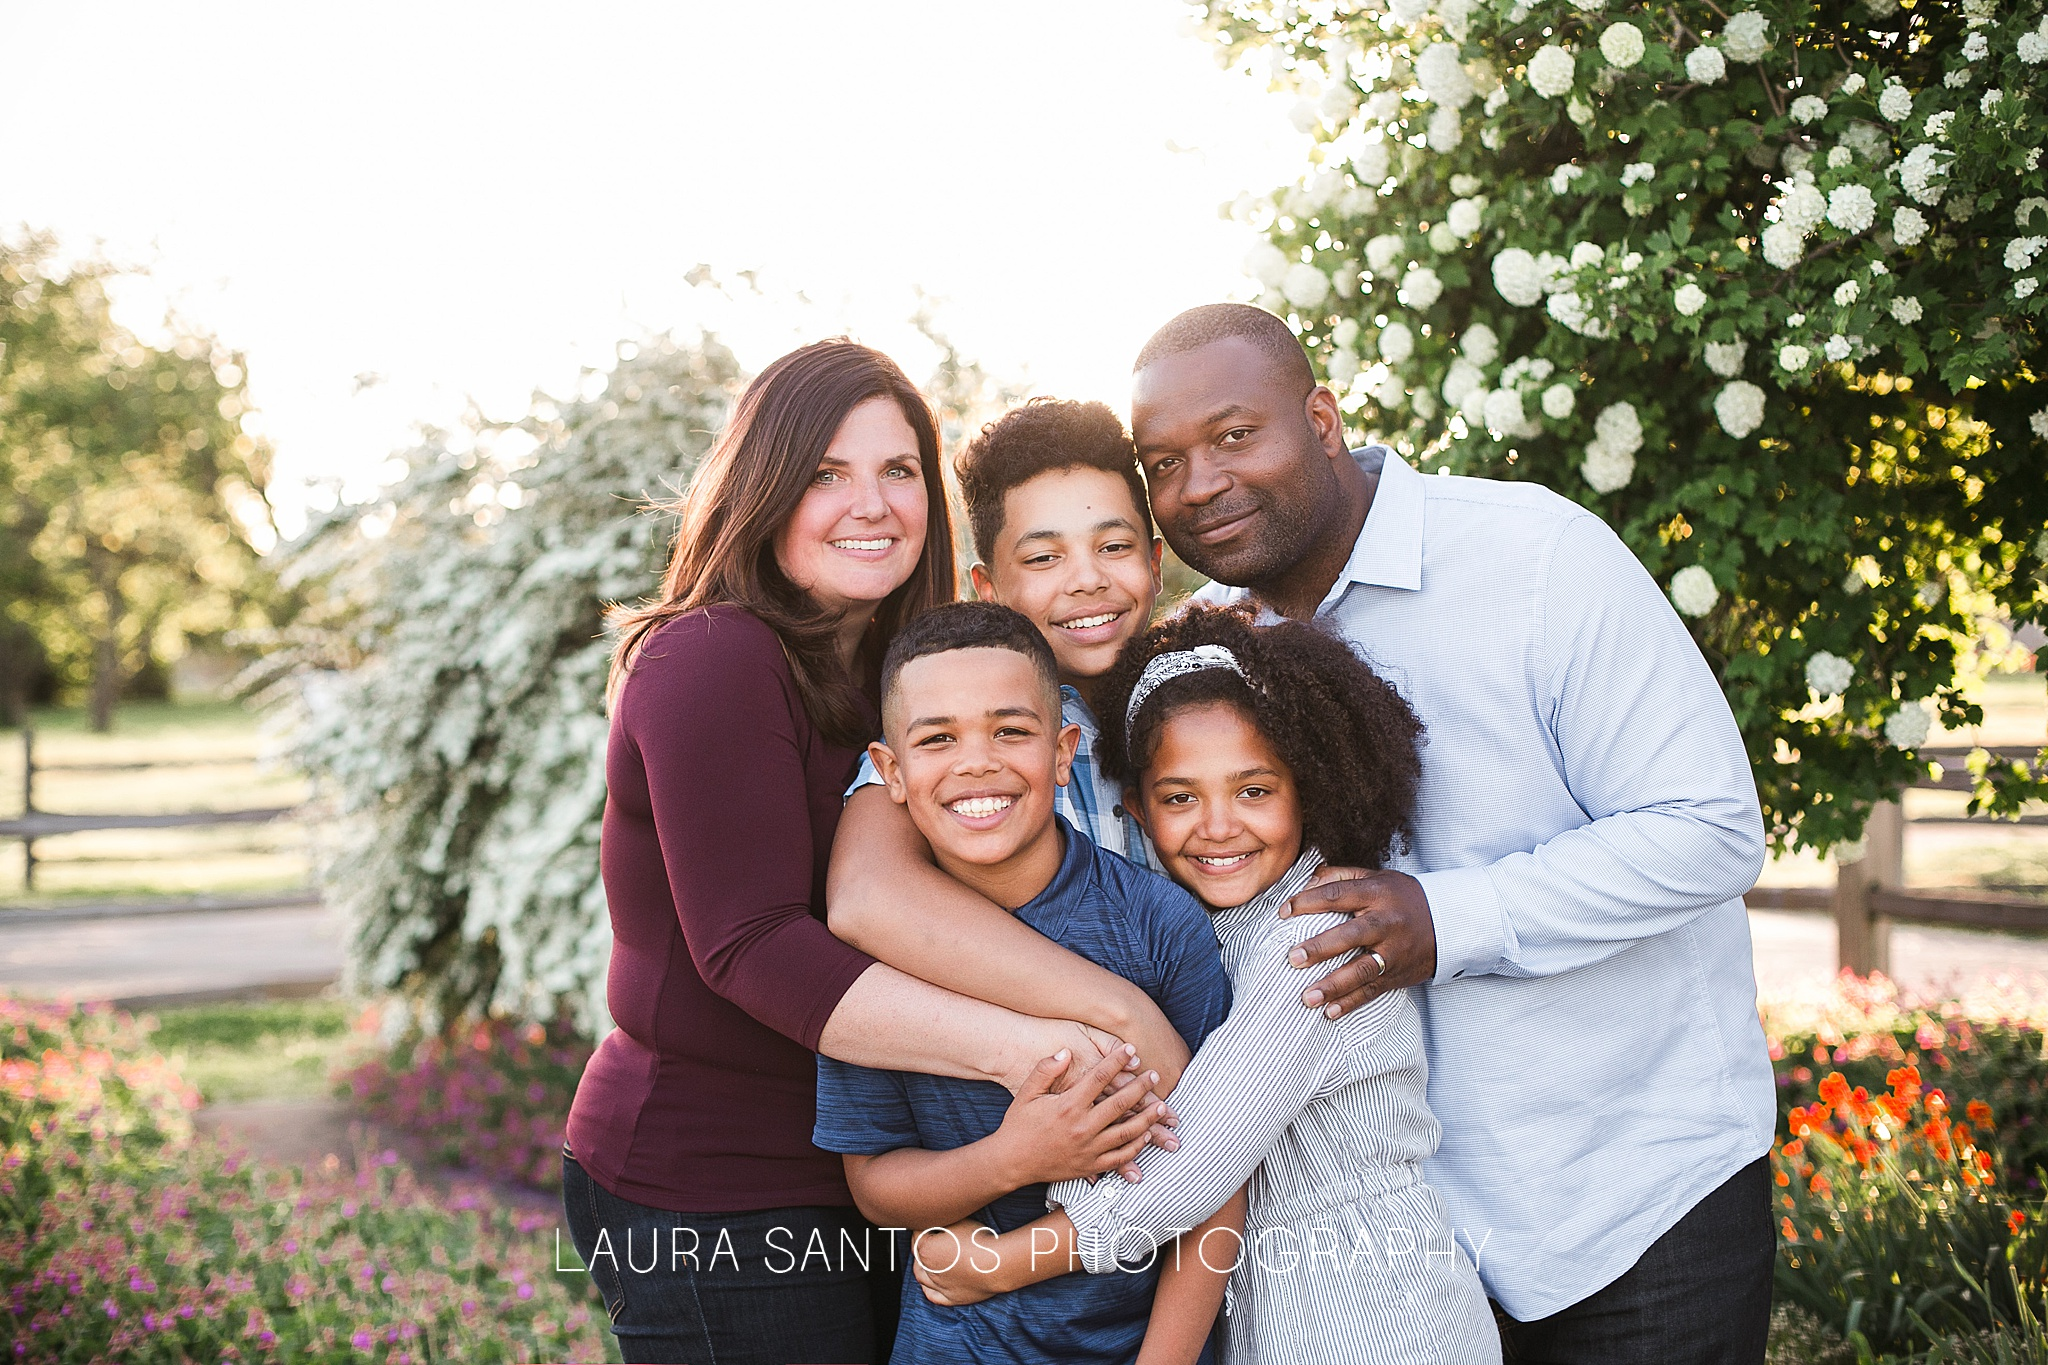 Laura Santos Photography Portland Oregon Family Photographer_0930.jpg